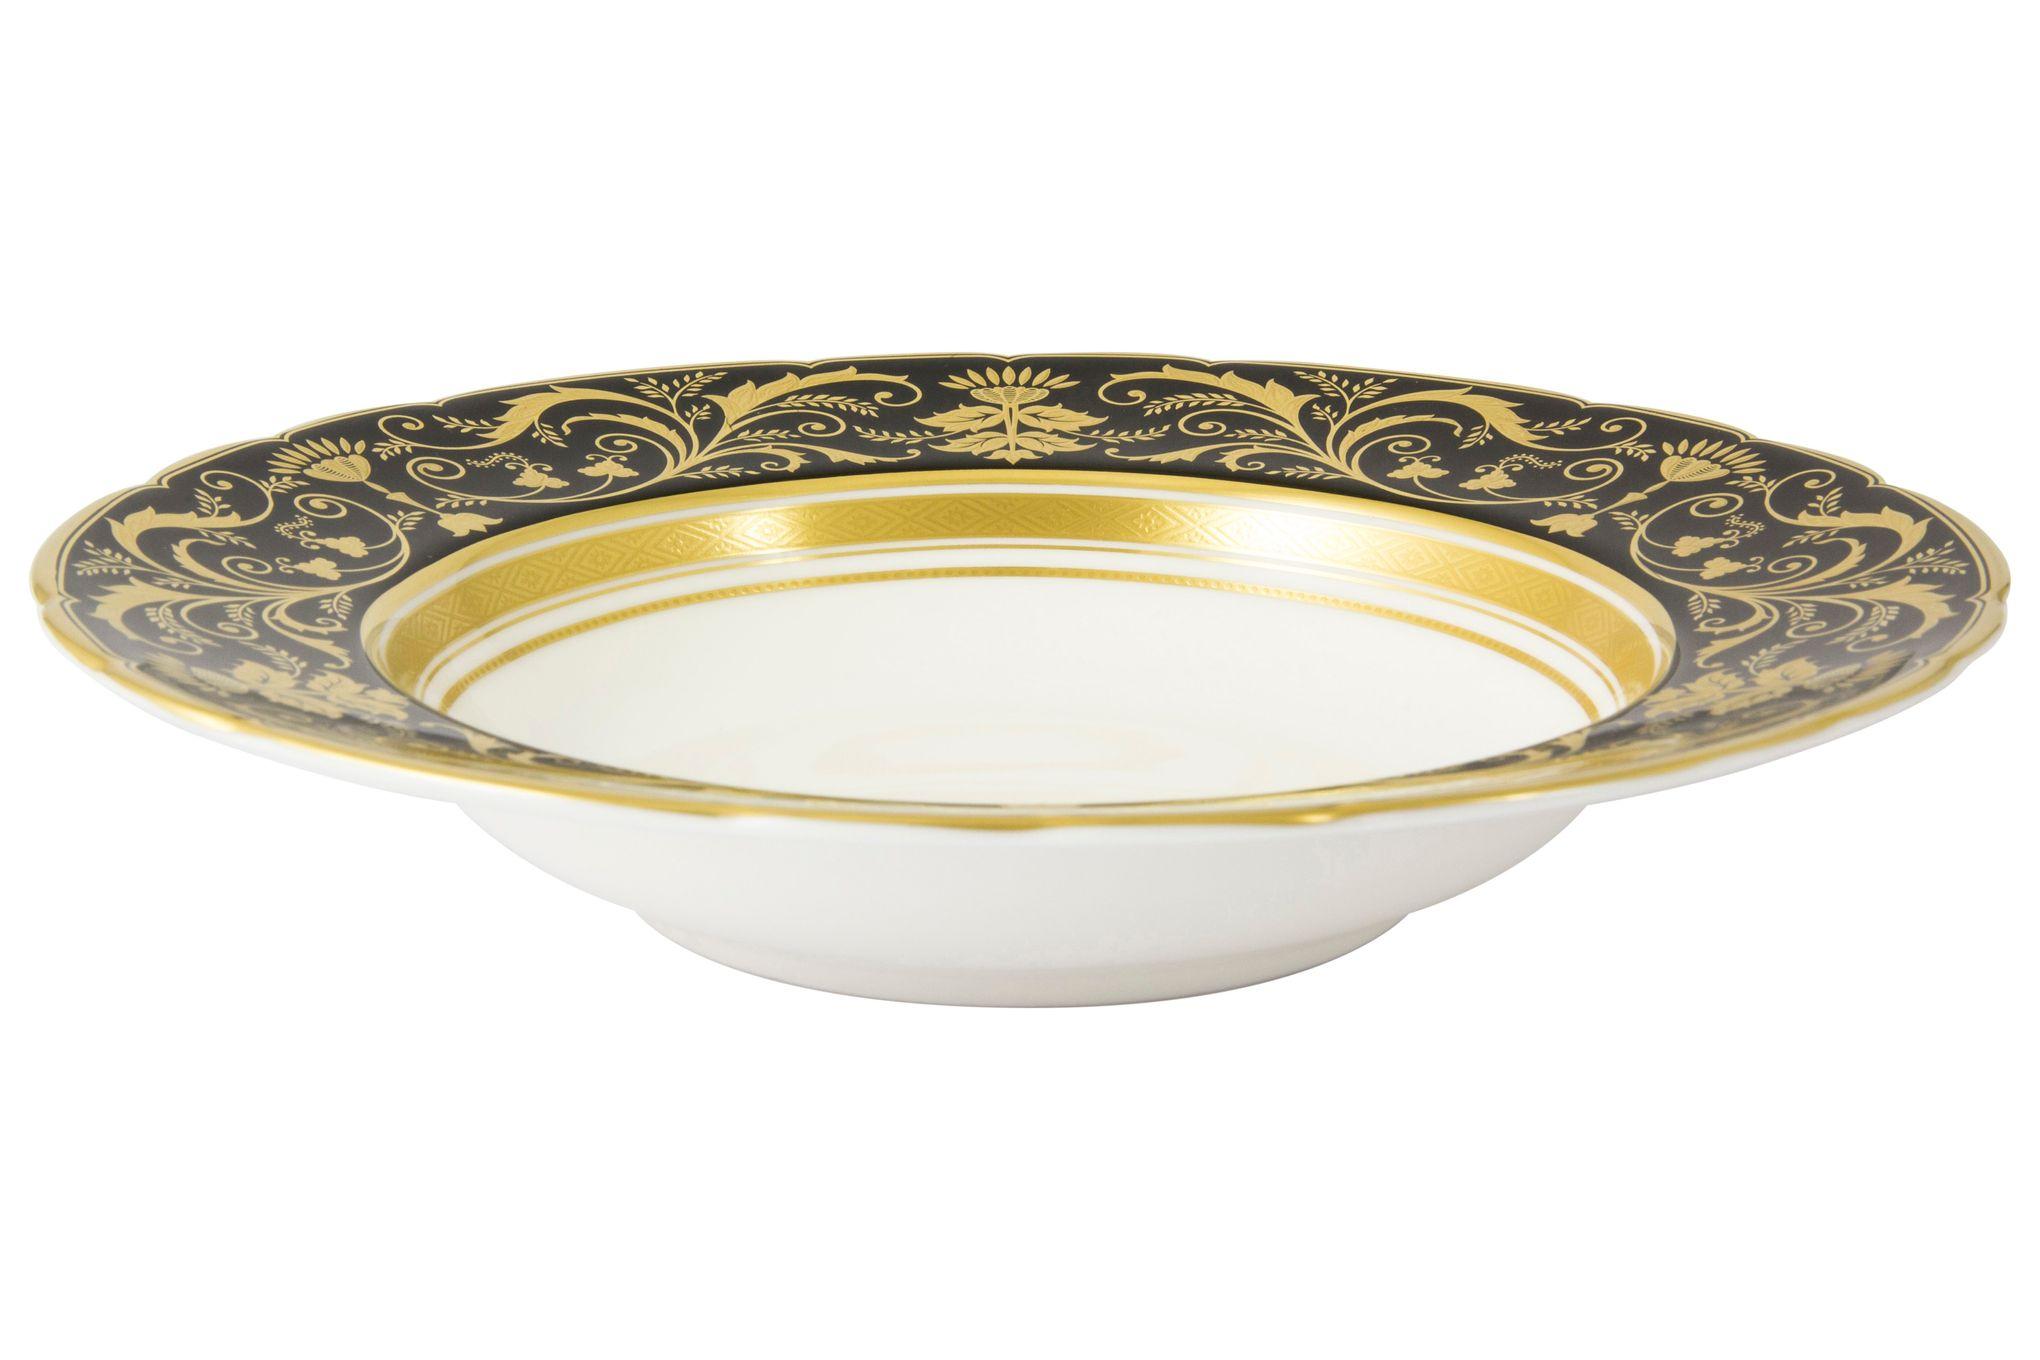 Royal Crown Derby Regency - Black Rimmed Bowl 21.5cm thumb 1